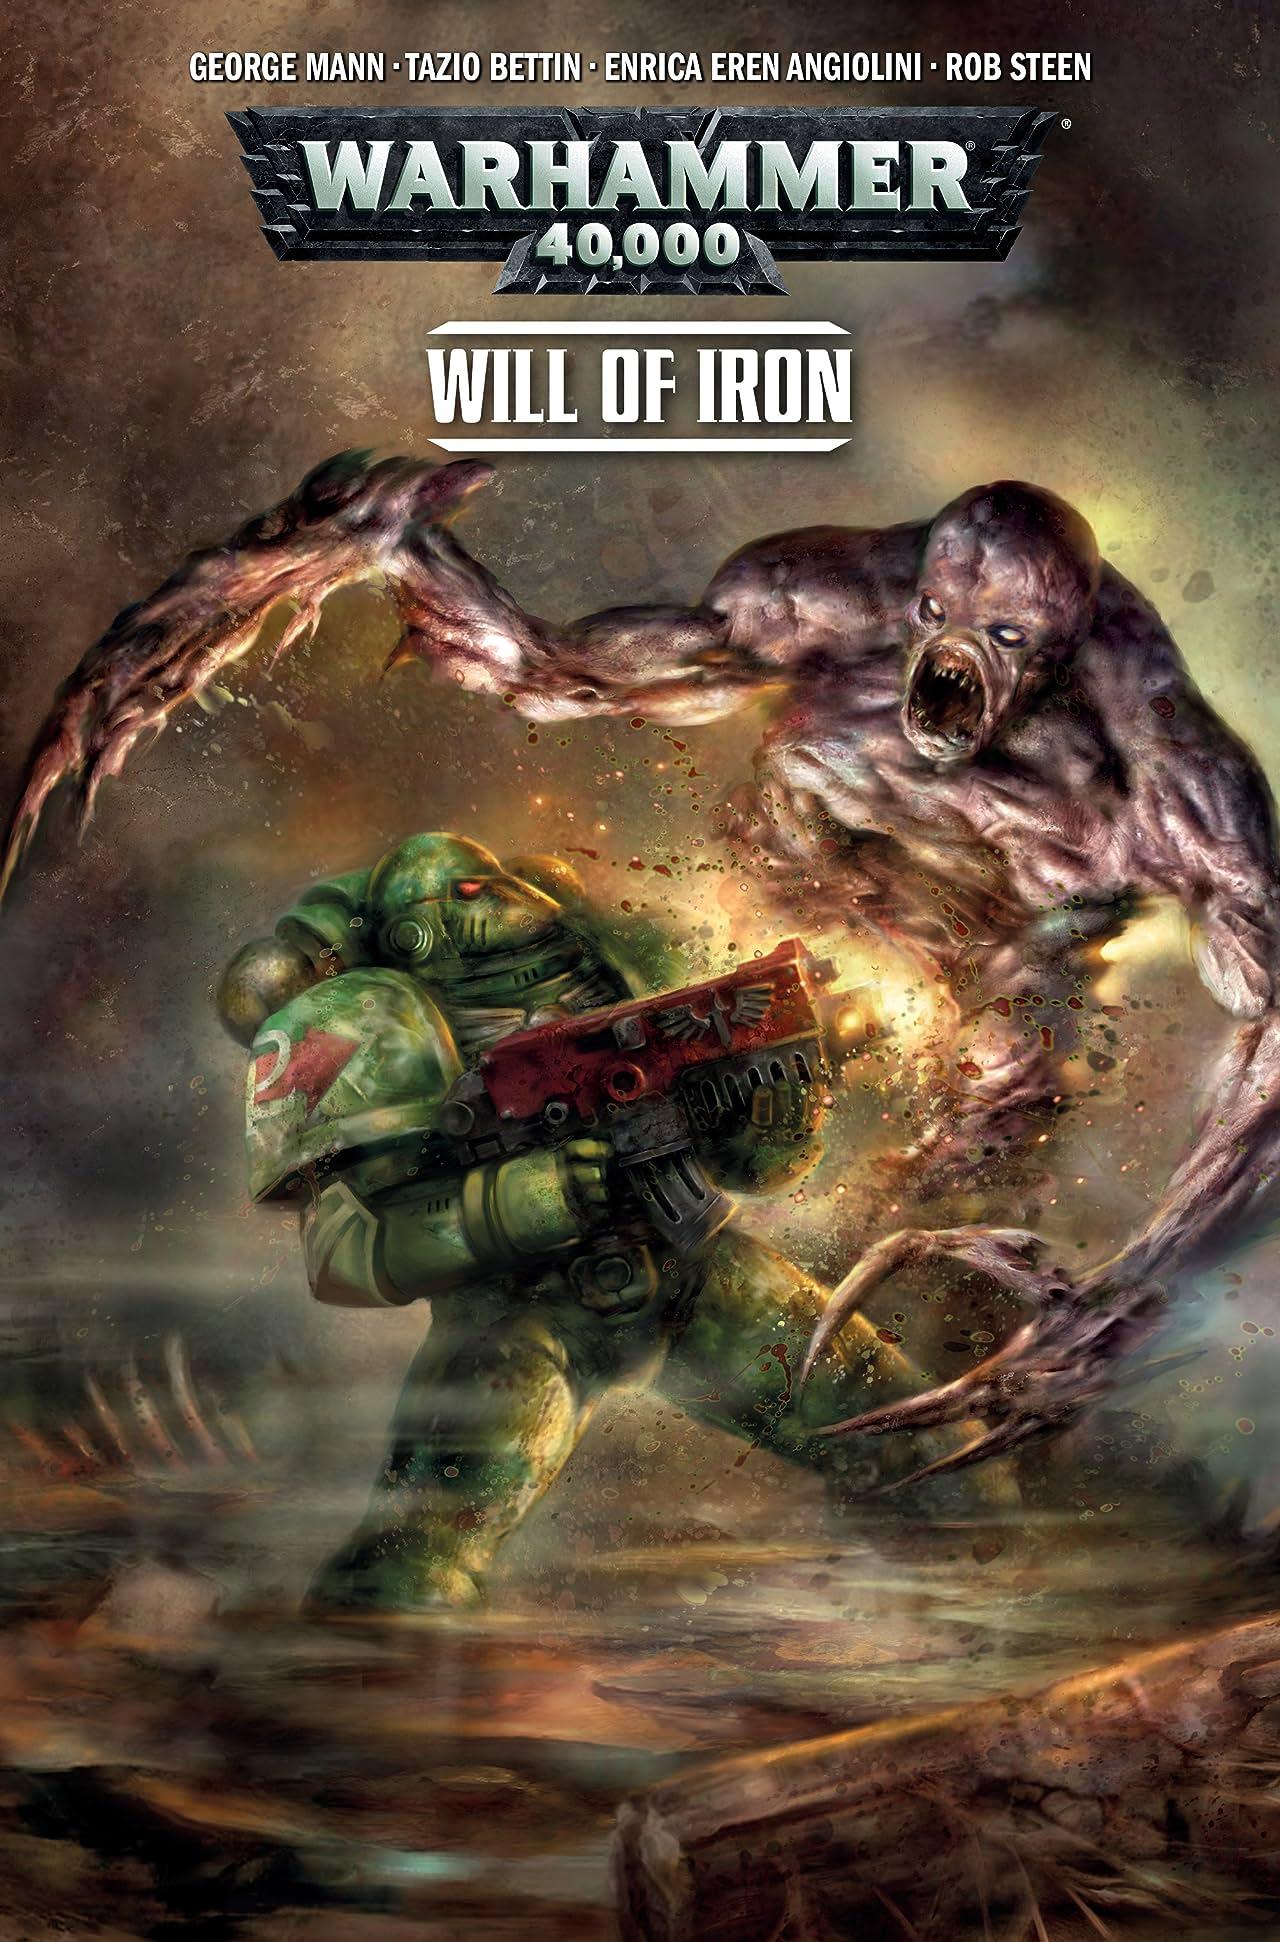 Warhammer 40,000: Will of Iron #4